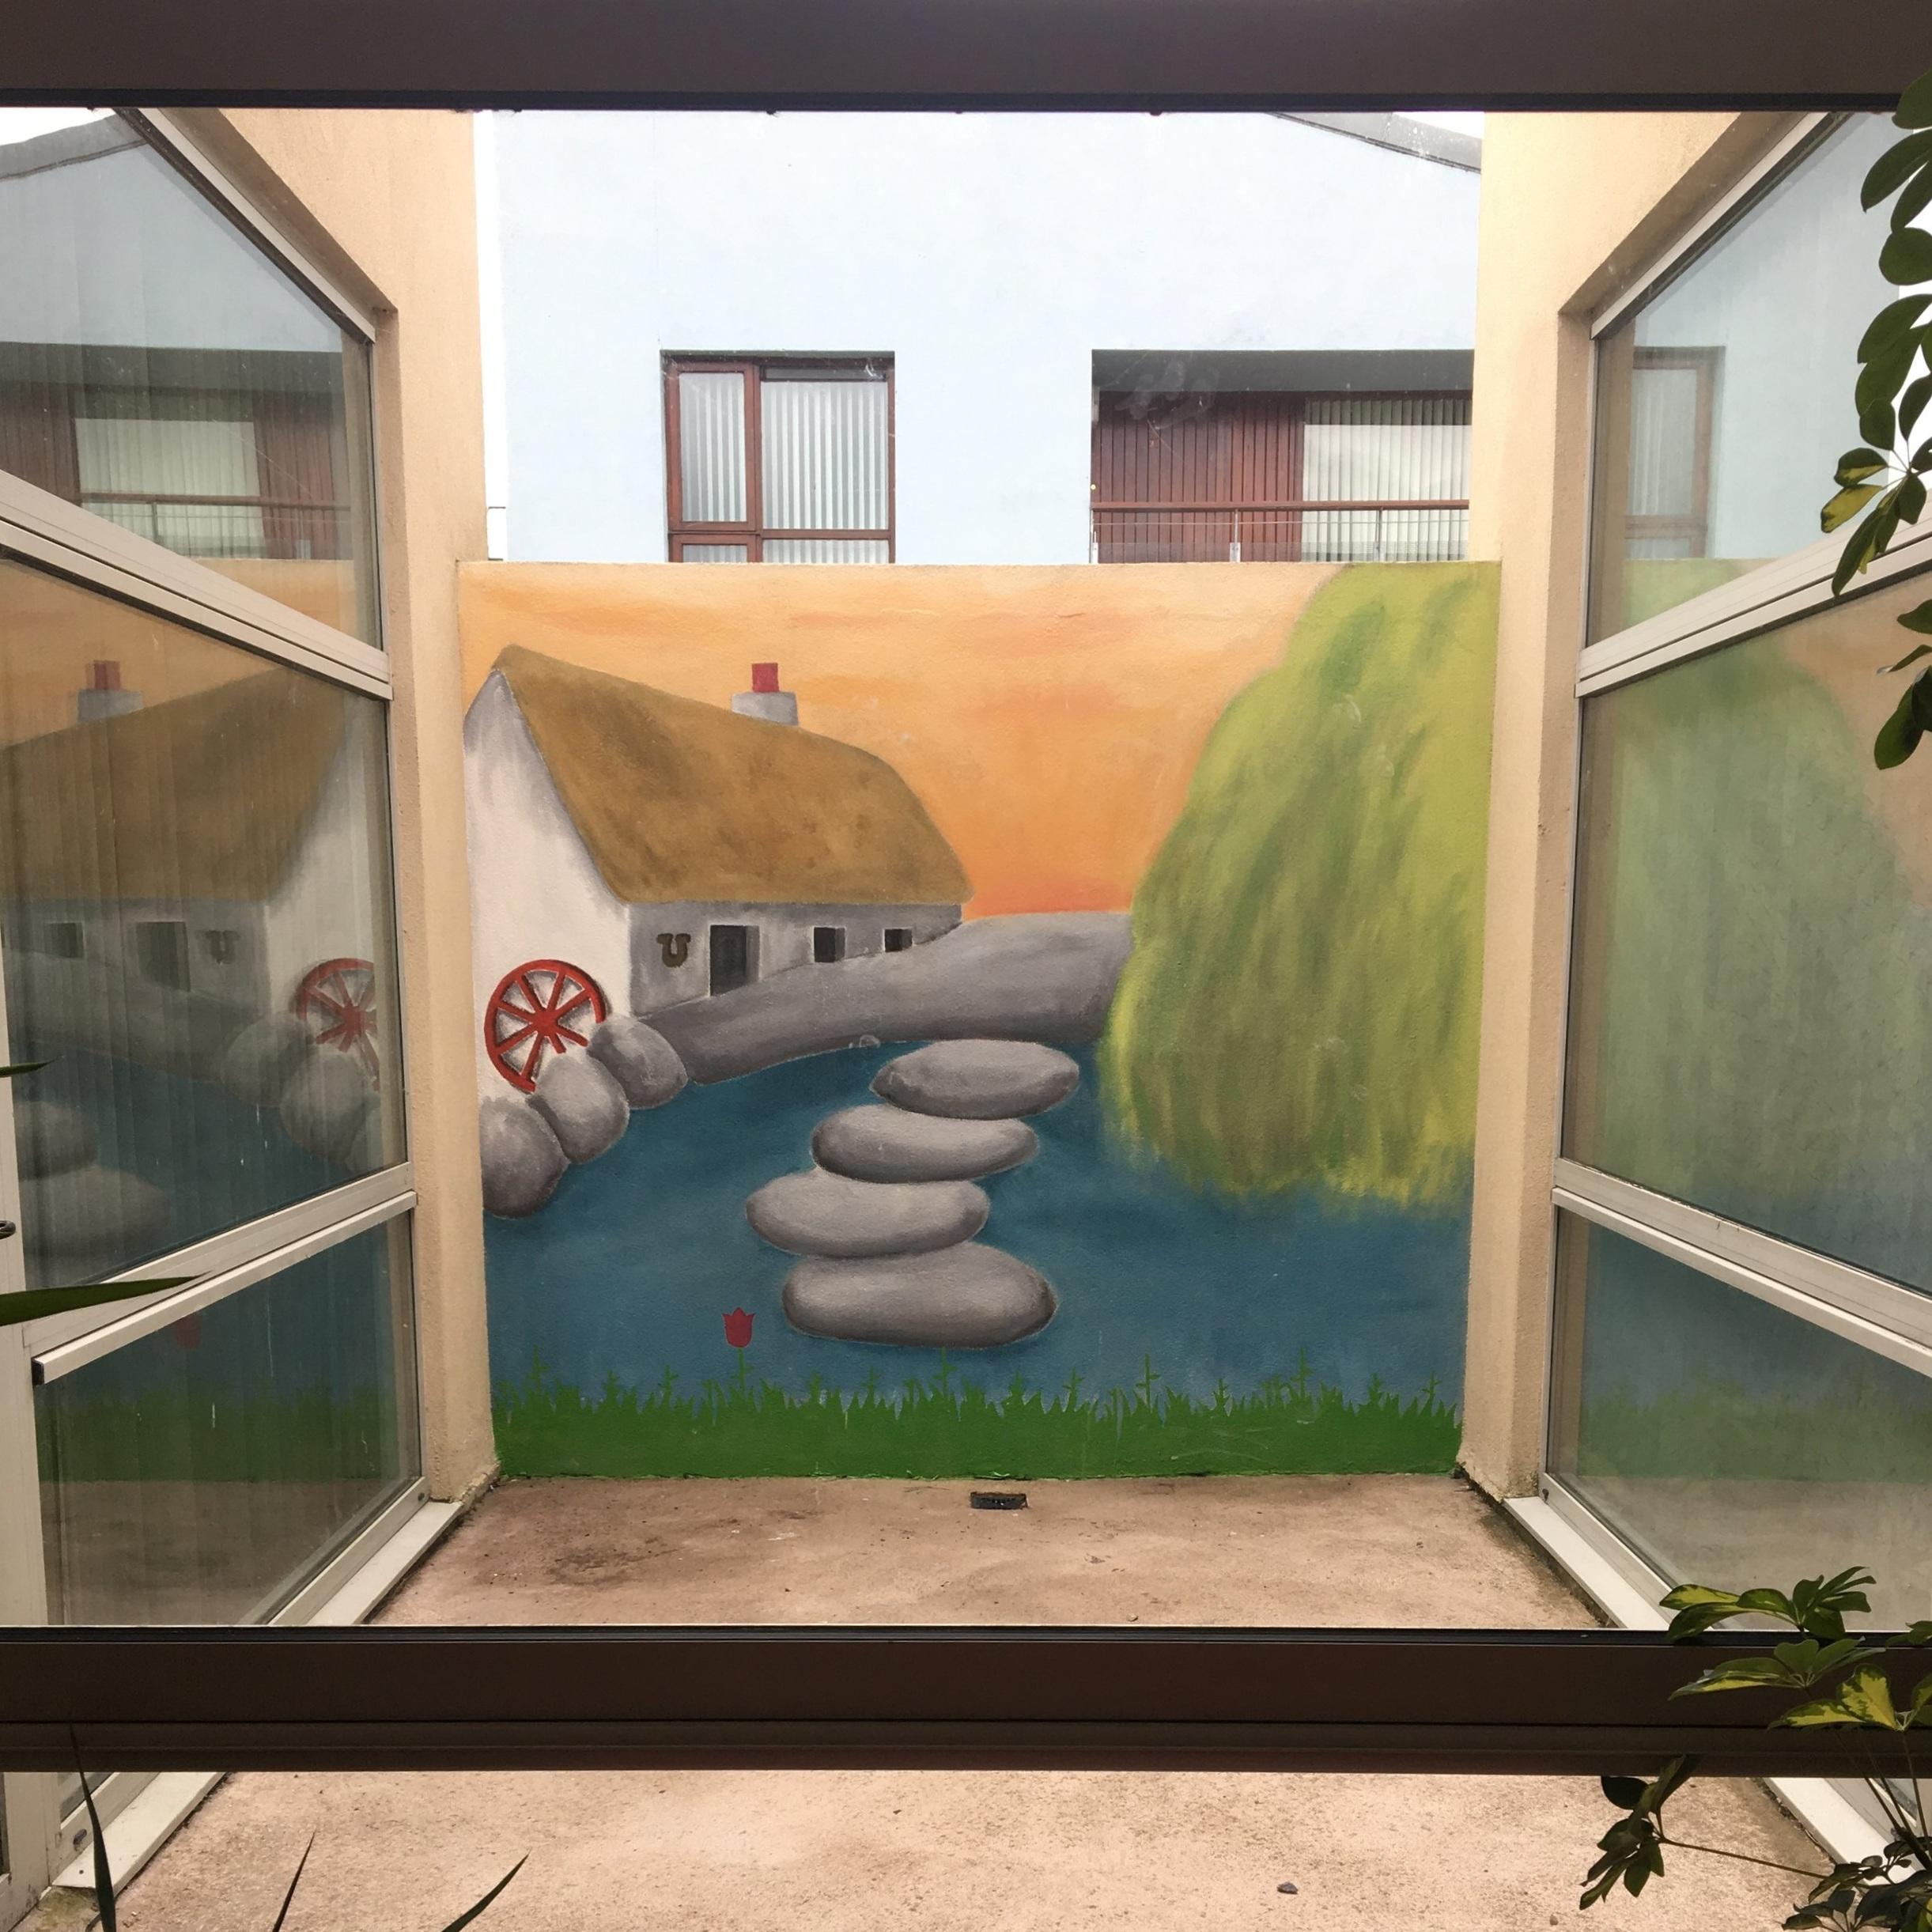 cranog abi ireland mural.jpg